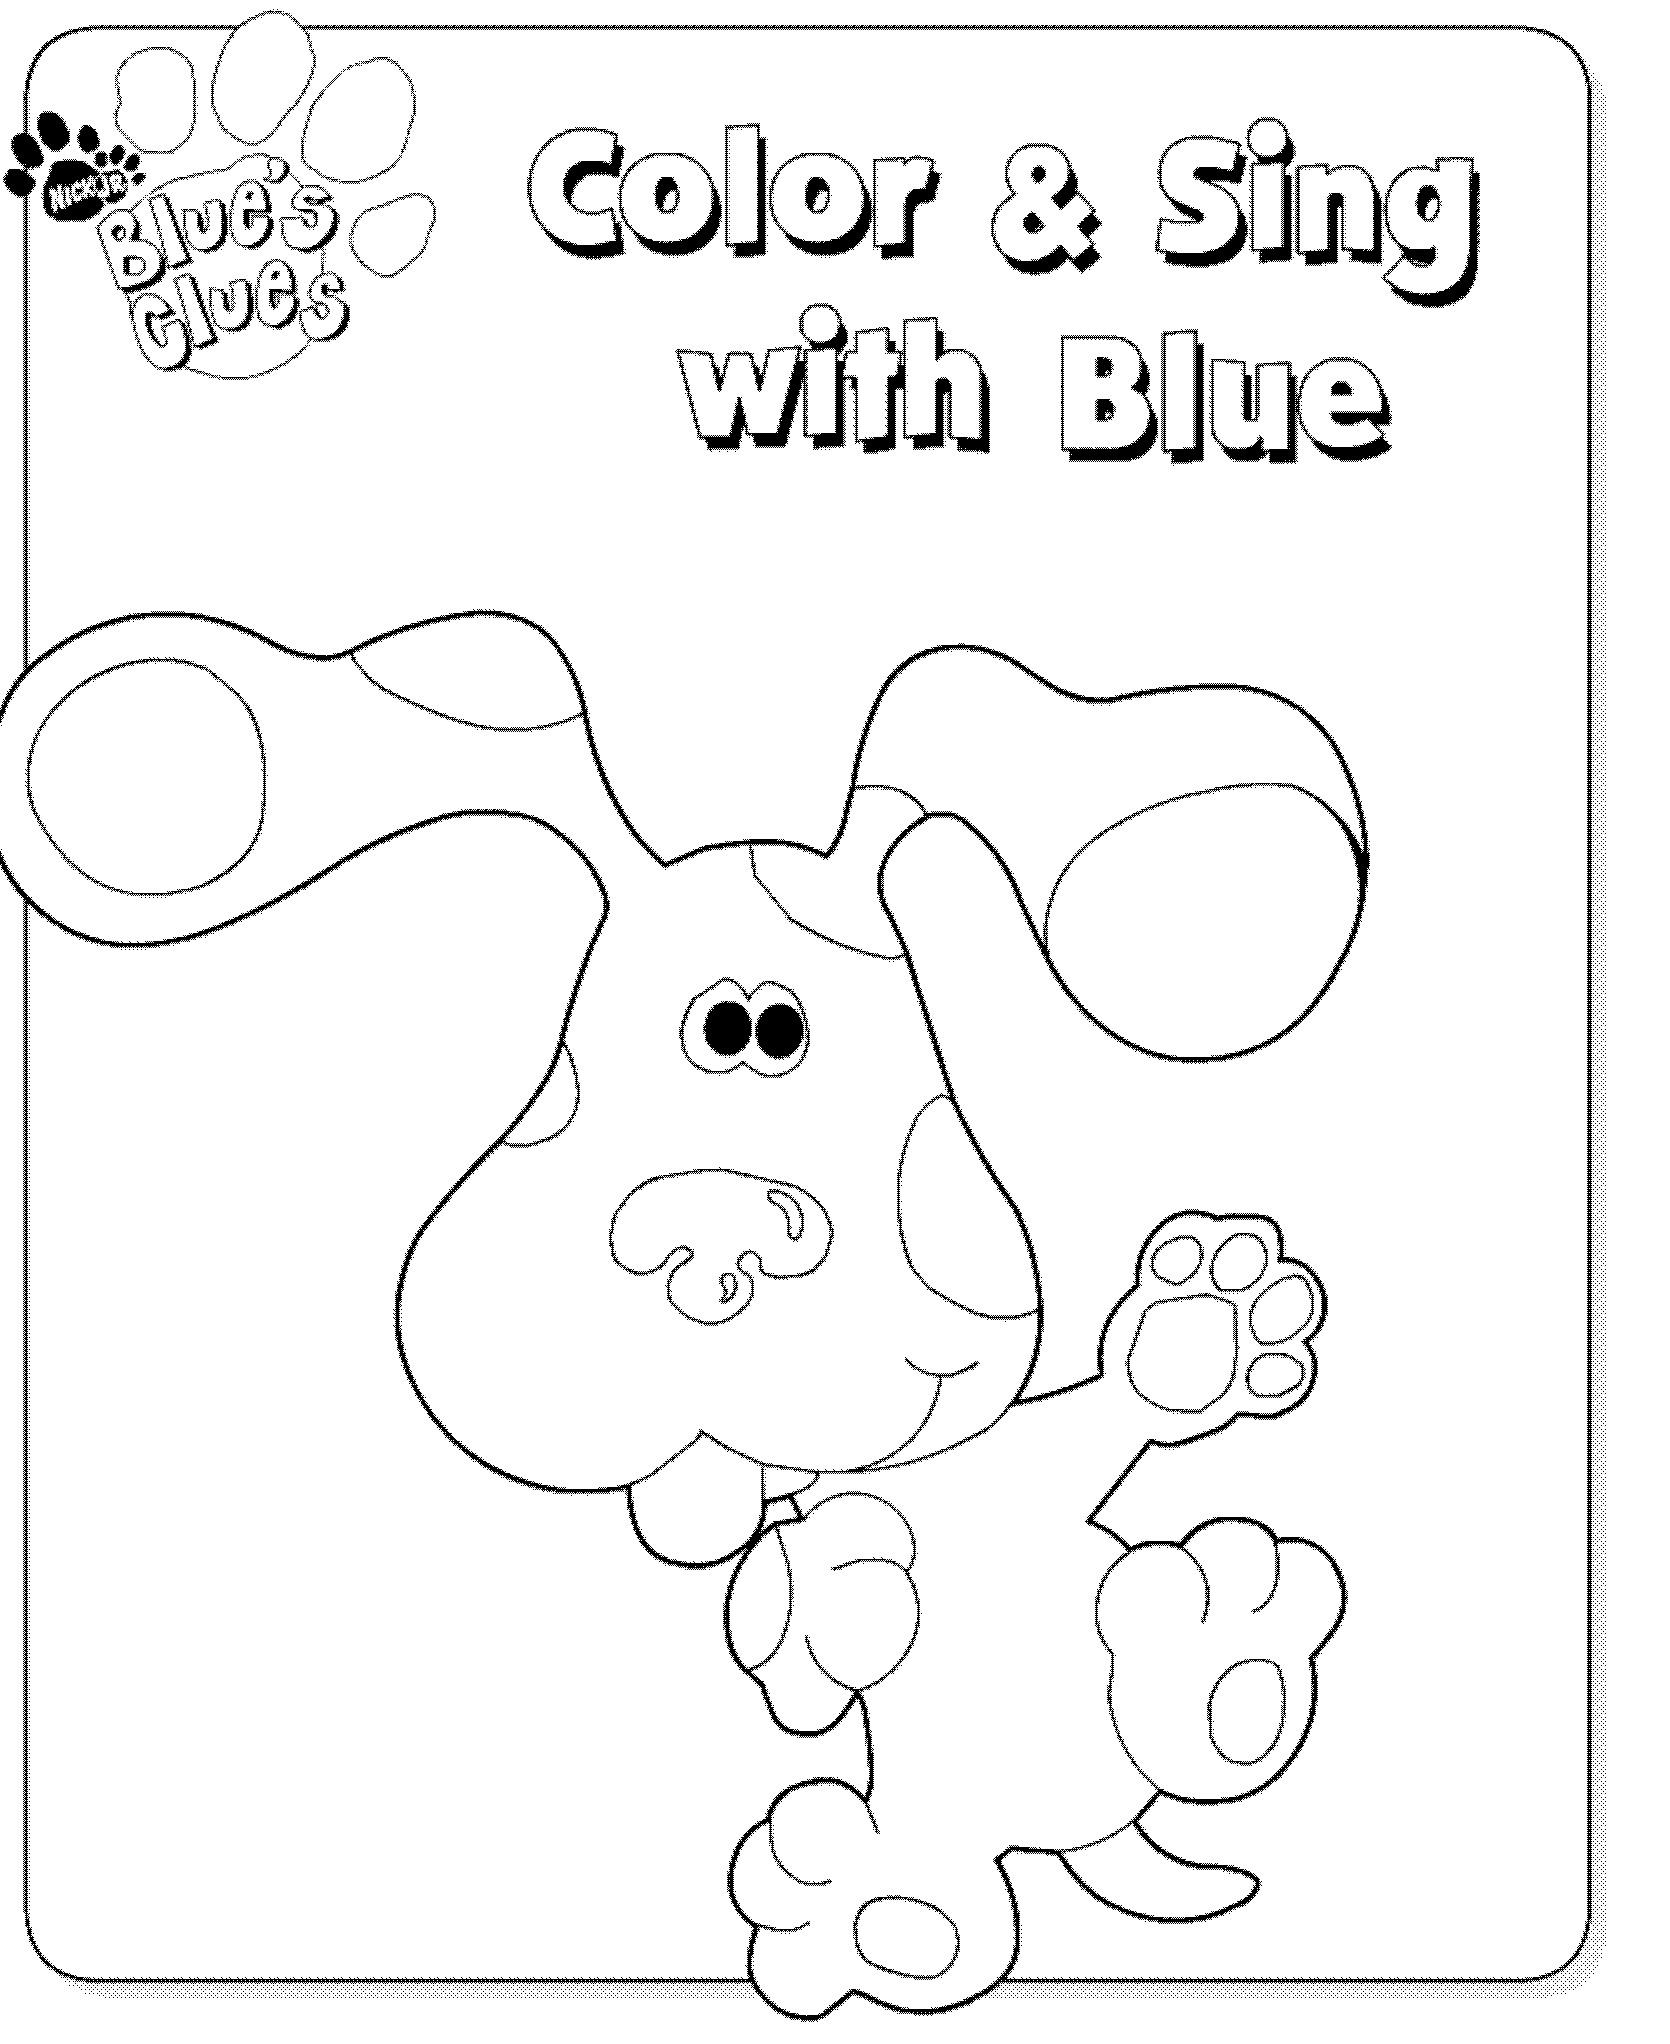 Blues Clues (1) kleurplaat